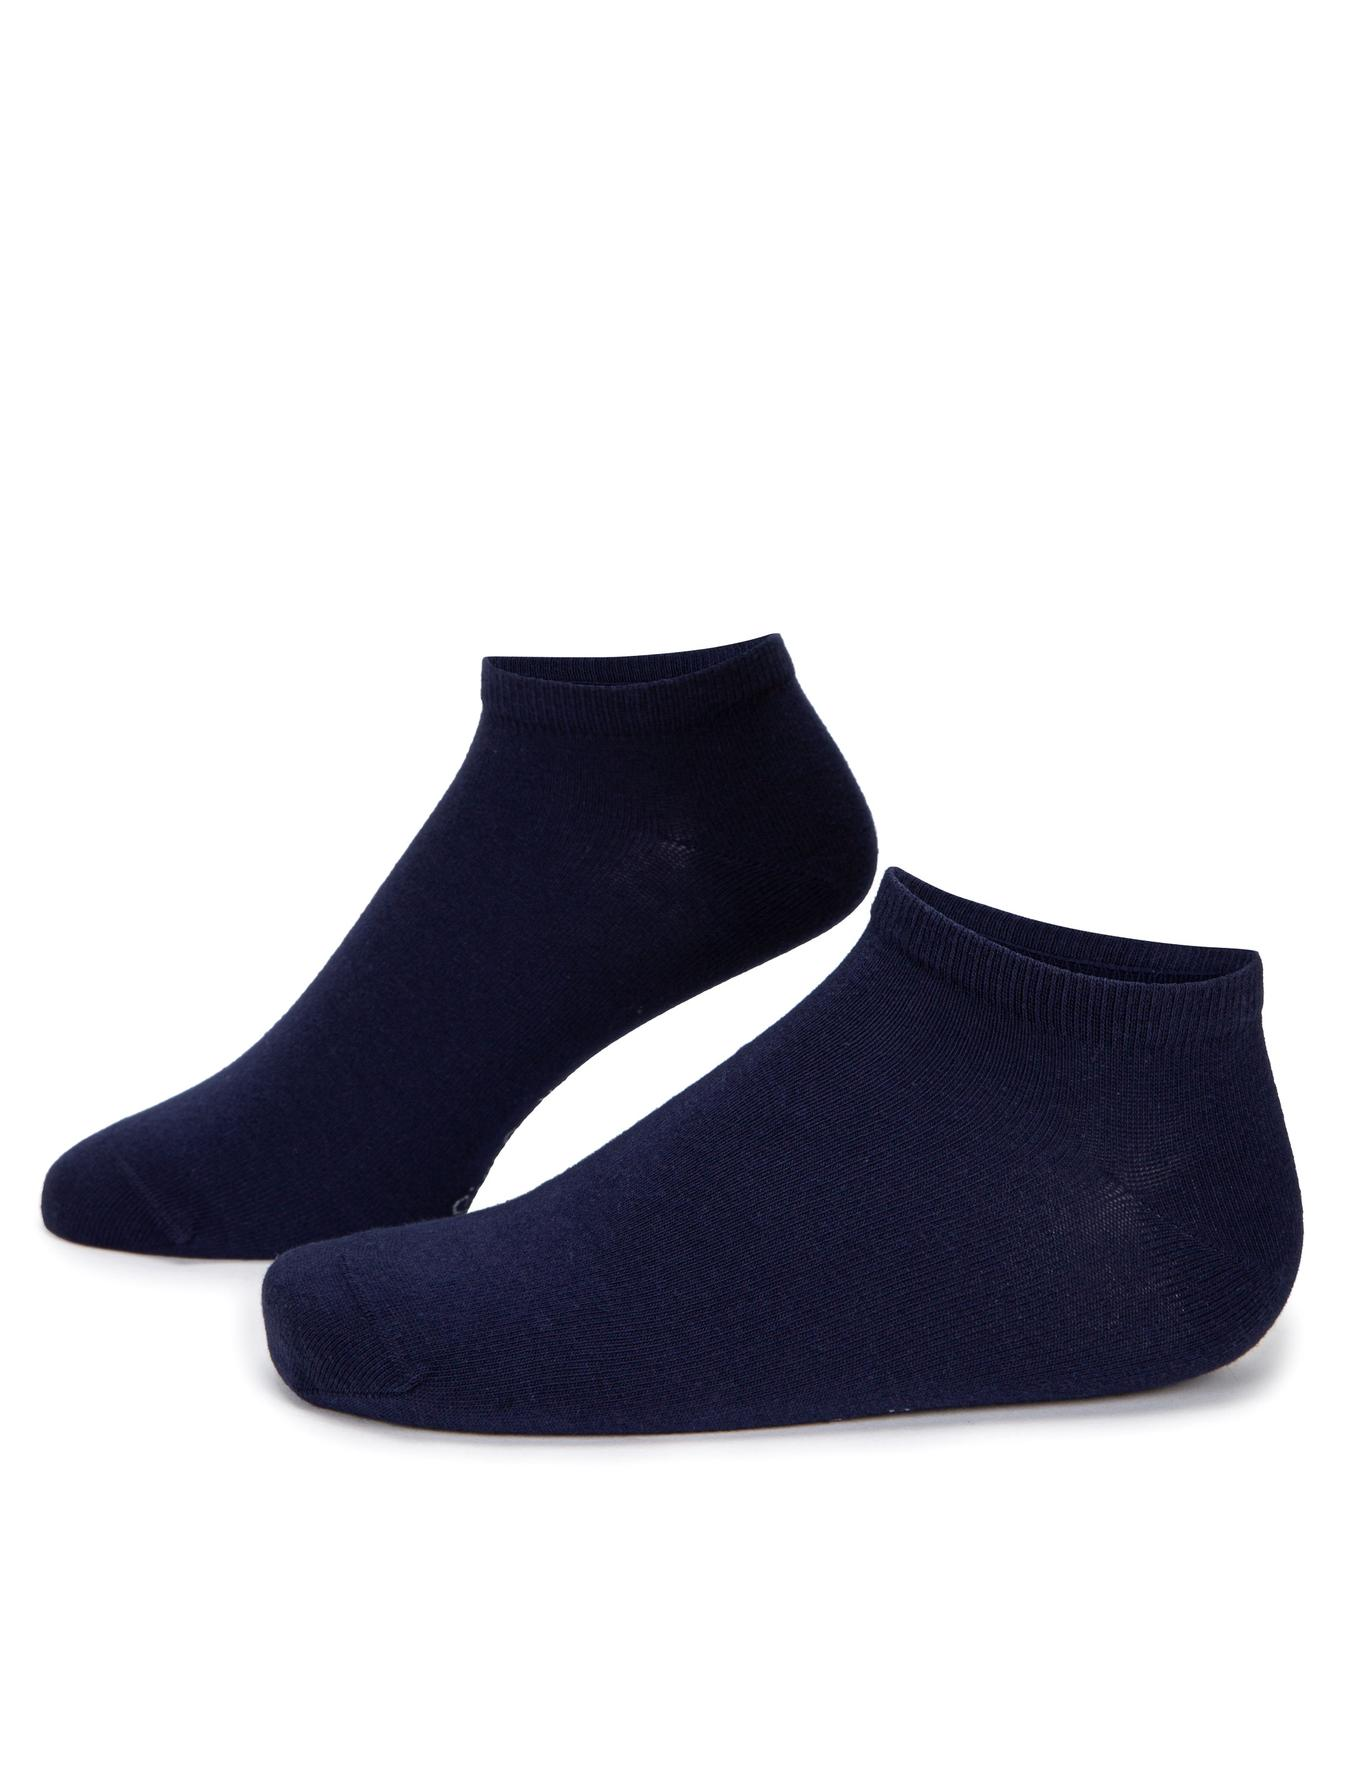 Lacivert Patik Çorap